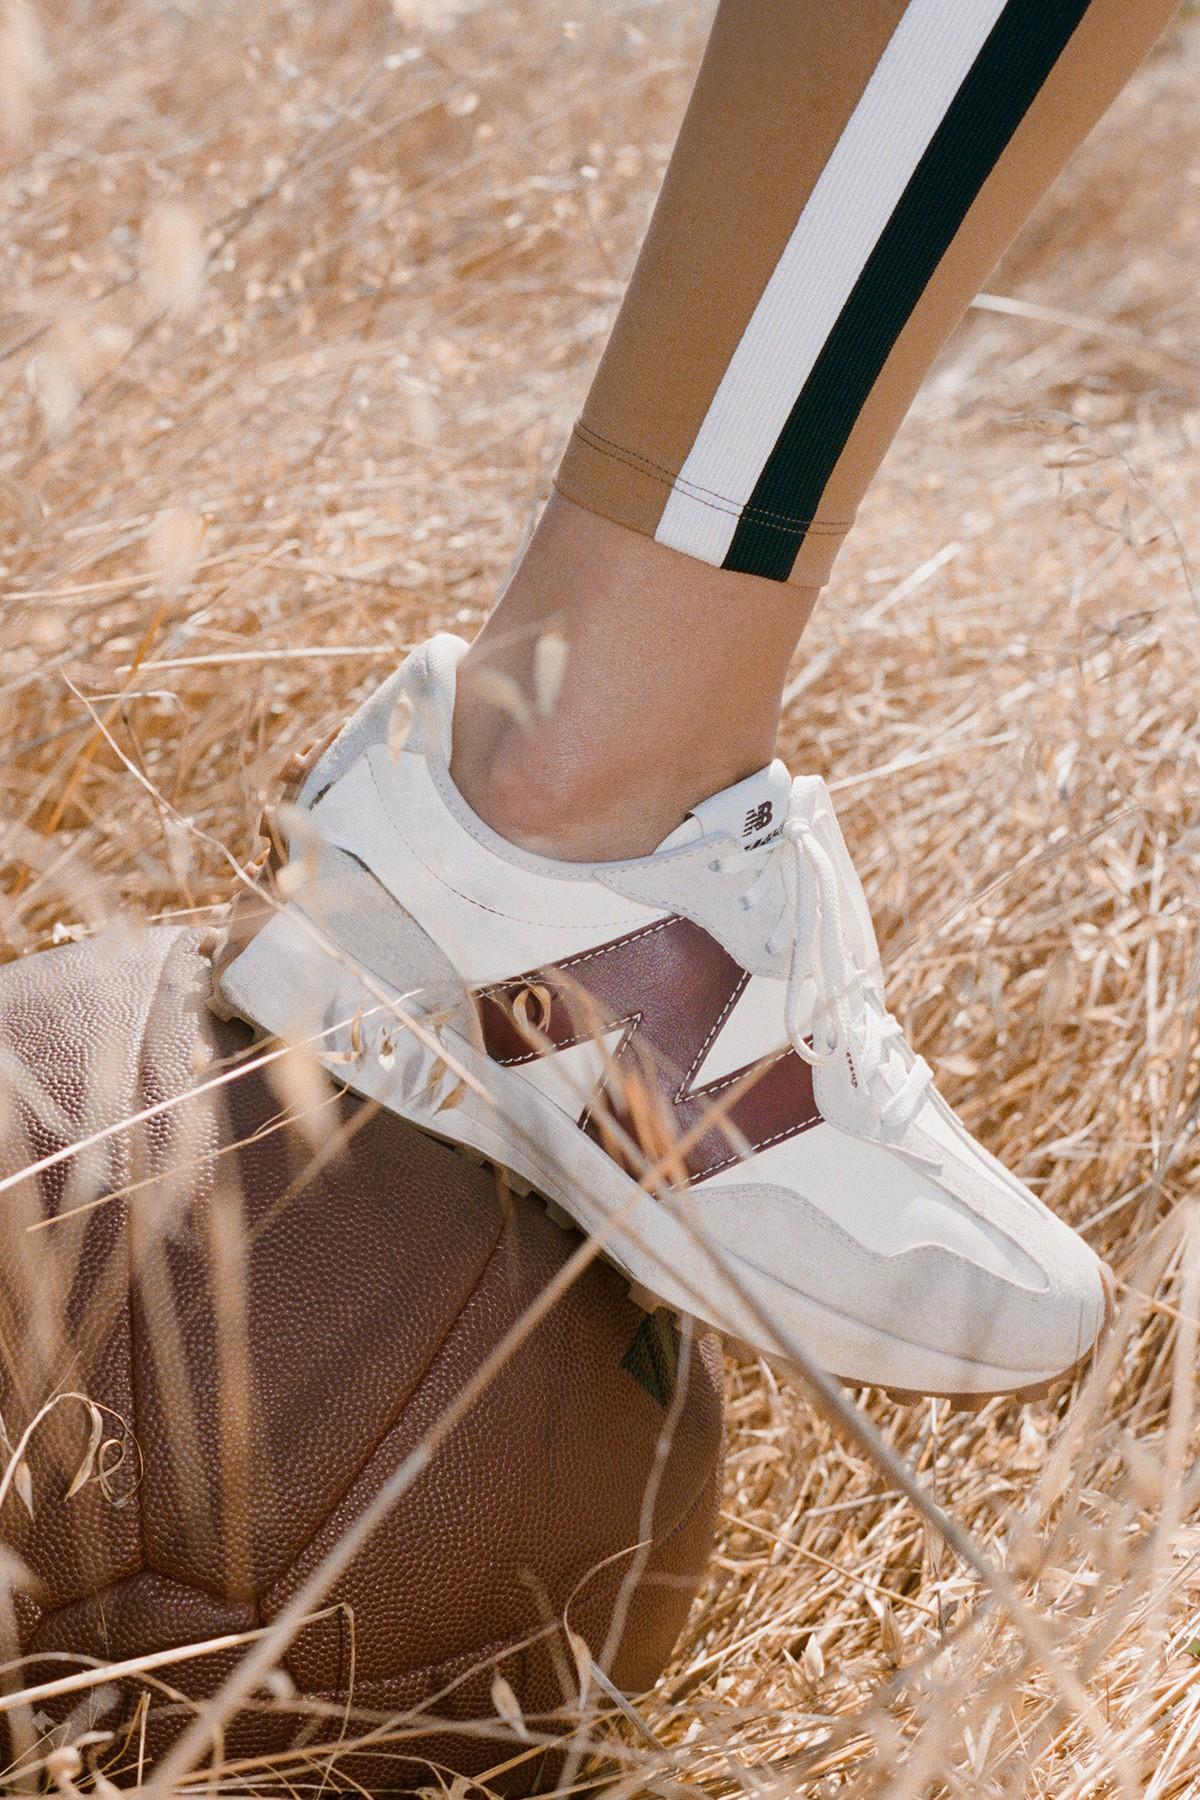 staud new balance activewear collaboration collection 327 sneaker bike shorts leggings